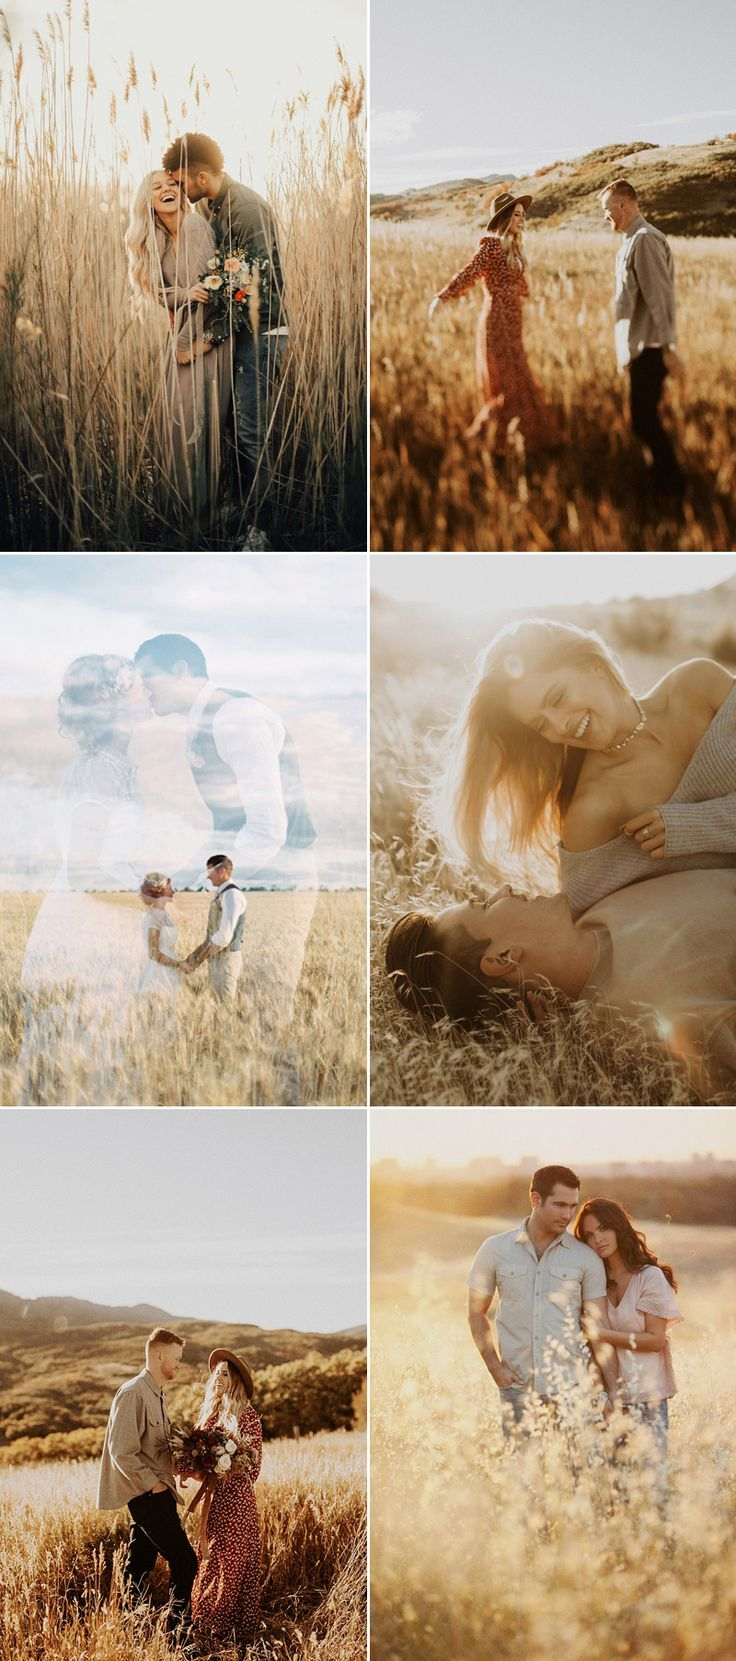 27 Utterly Romantic Field Engagement Photos – #Engagement #Field #Photos #Romant…